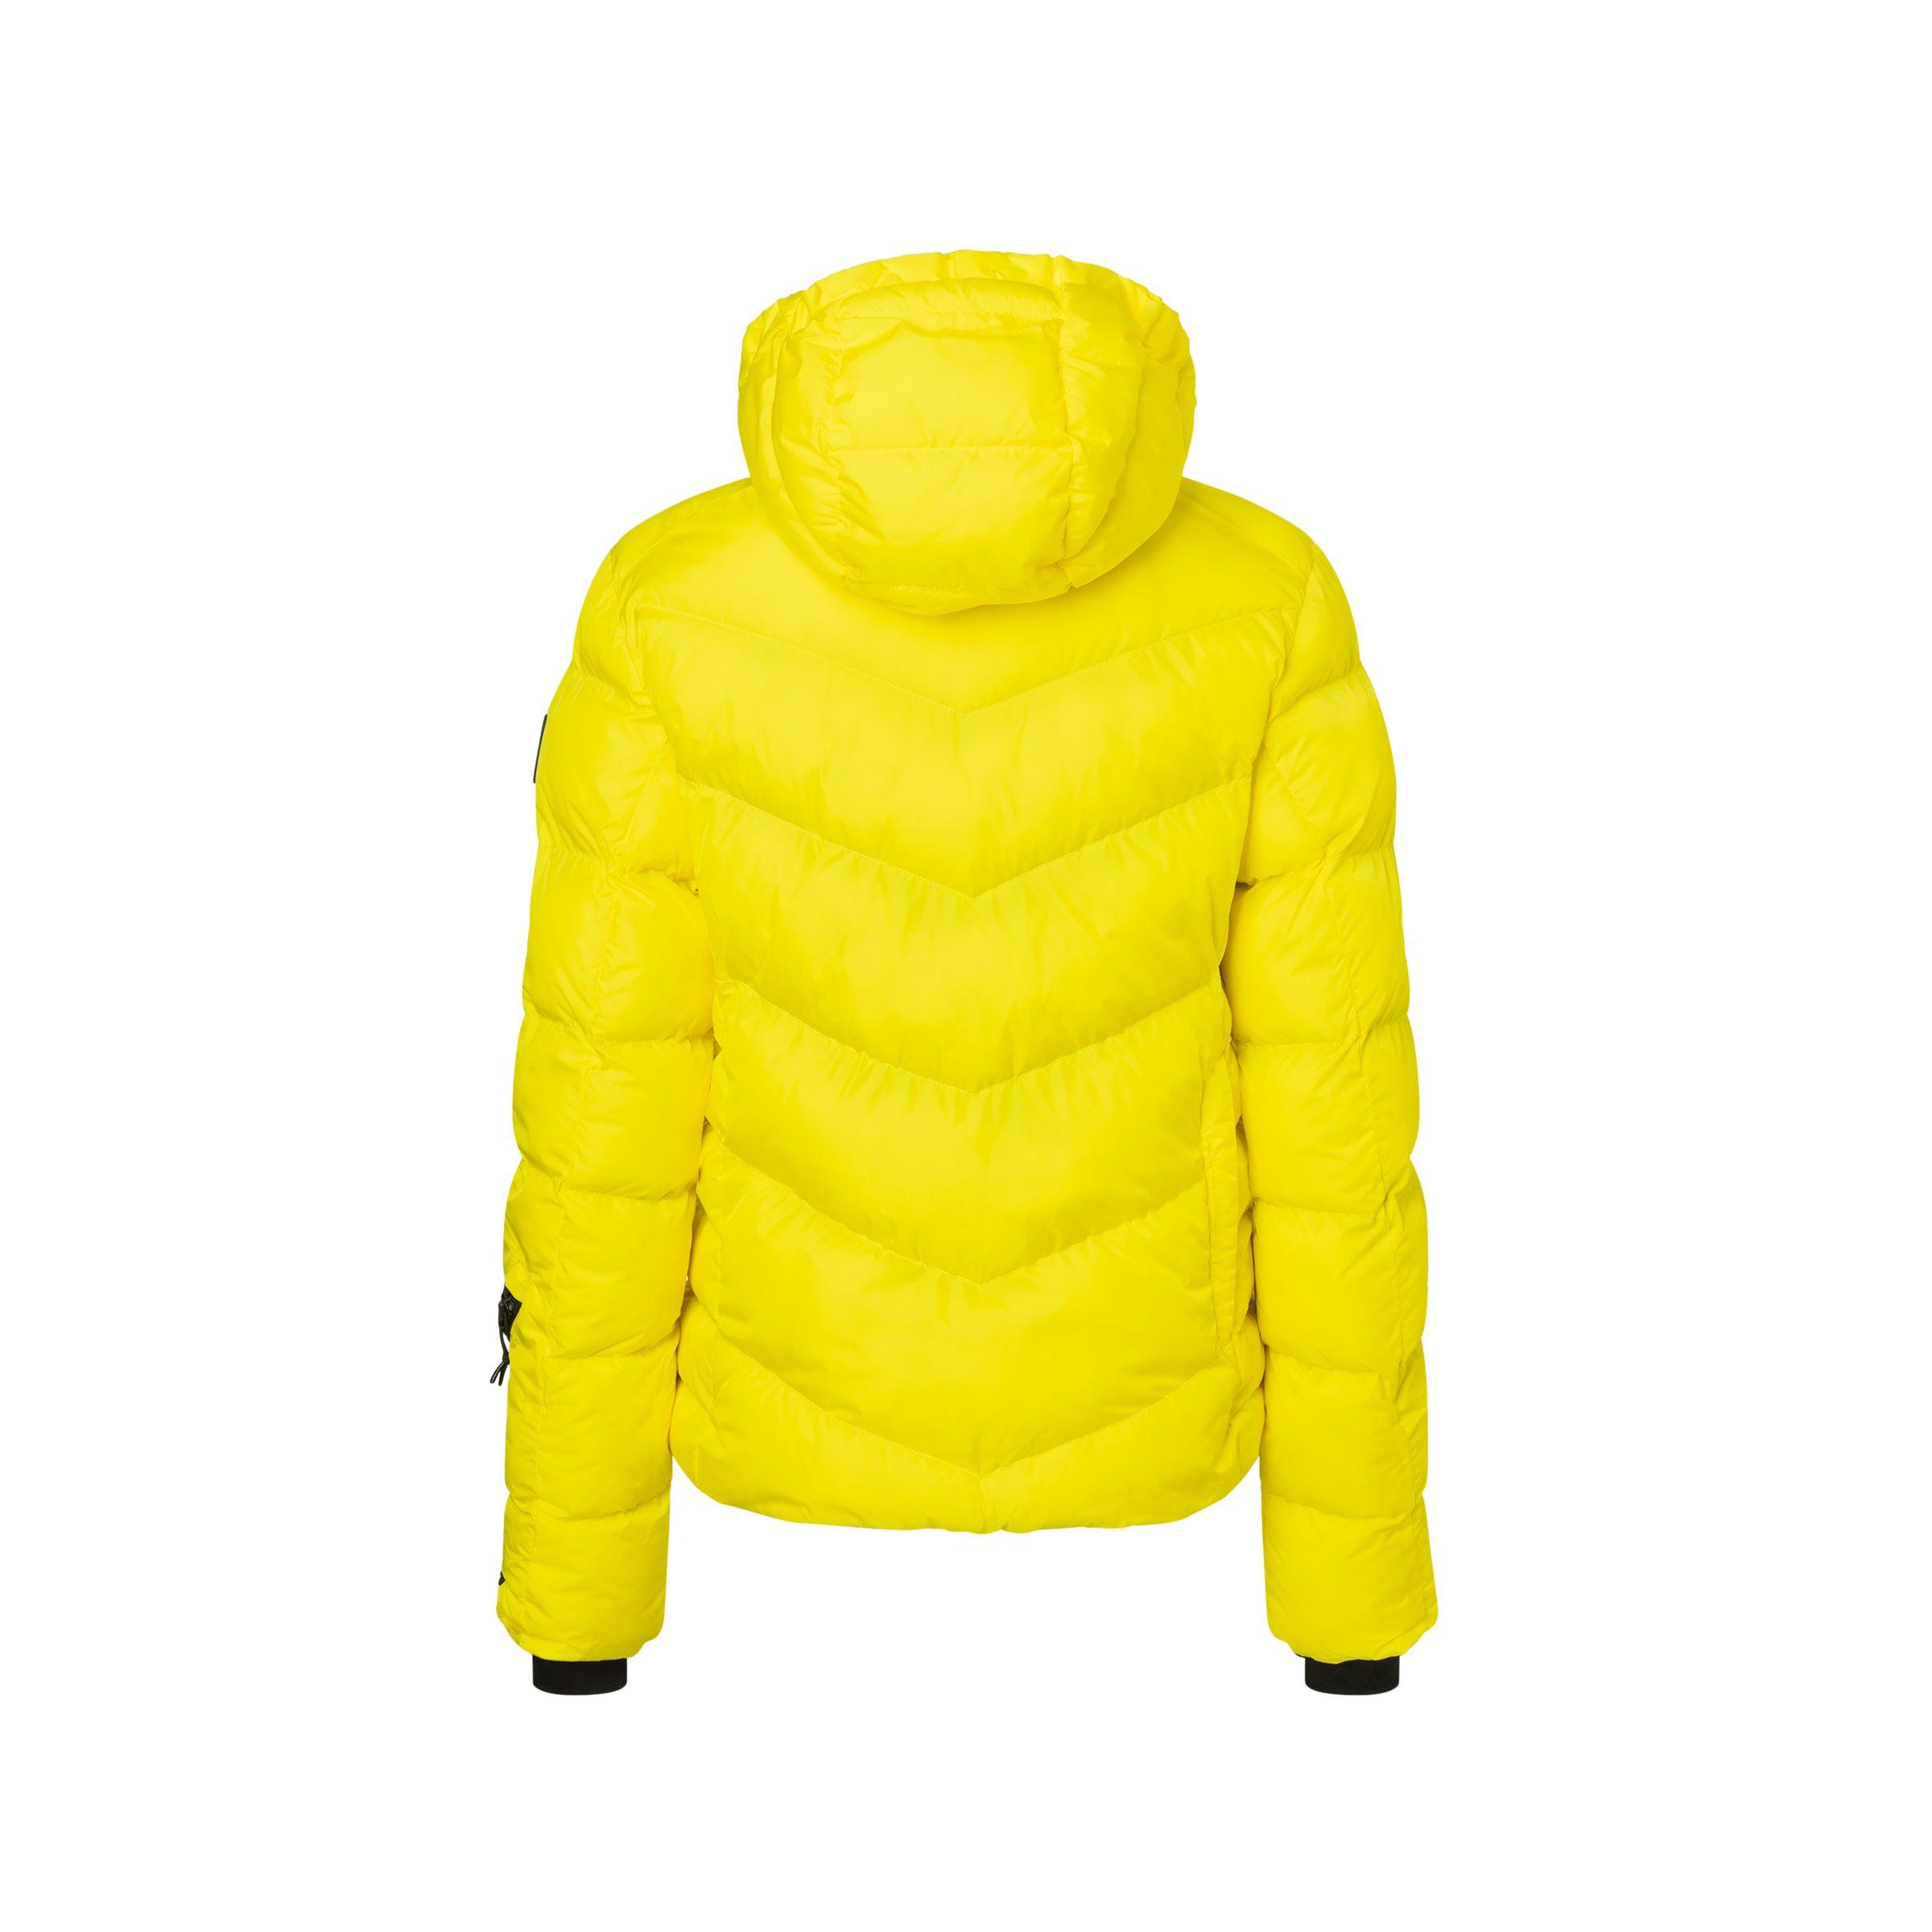 Geci Ski & Snow -  bogner fire and ice SAELLY Ski Jacket